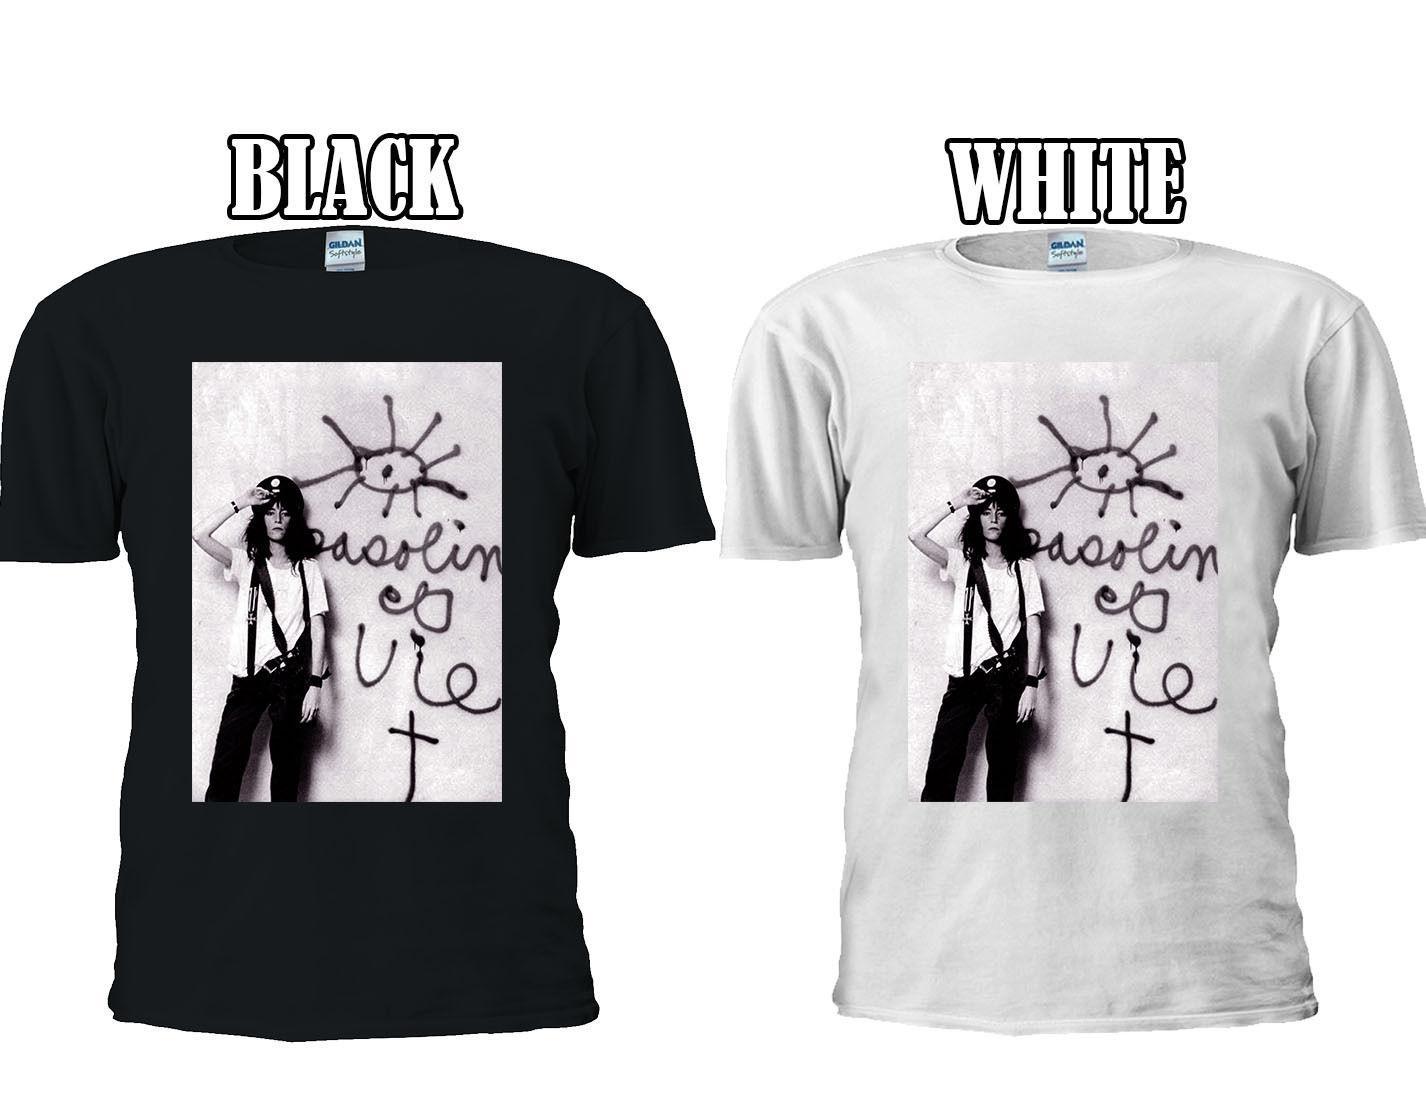 5aac67a6b95ab Patti Smith 70 S 80 S 90 S Punk Rock T Shirt Vest Tank Top Men Women Unisex  298 Men Women Unisex Fashion Tshirt Rude T Shirts Shirt Online From ...